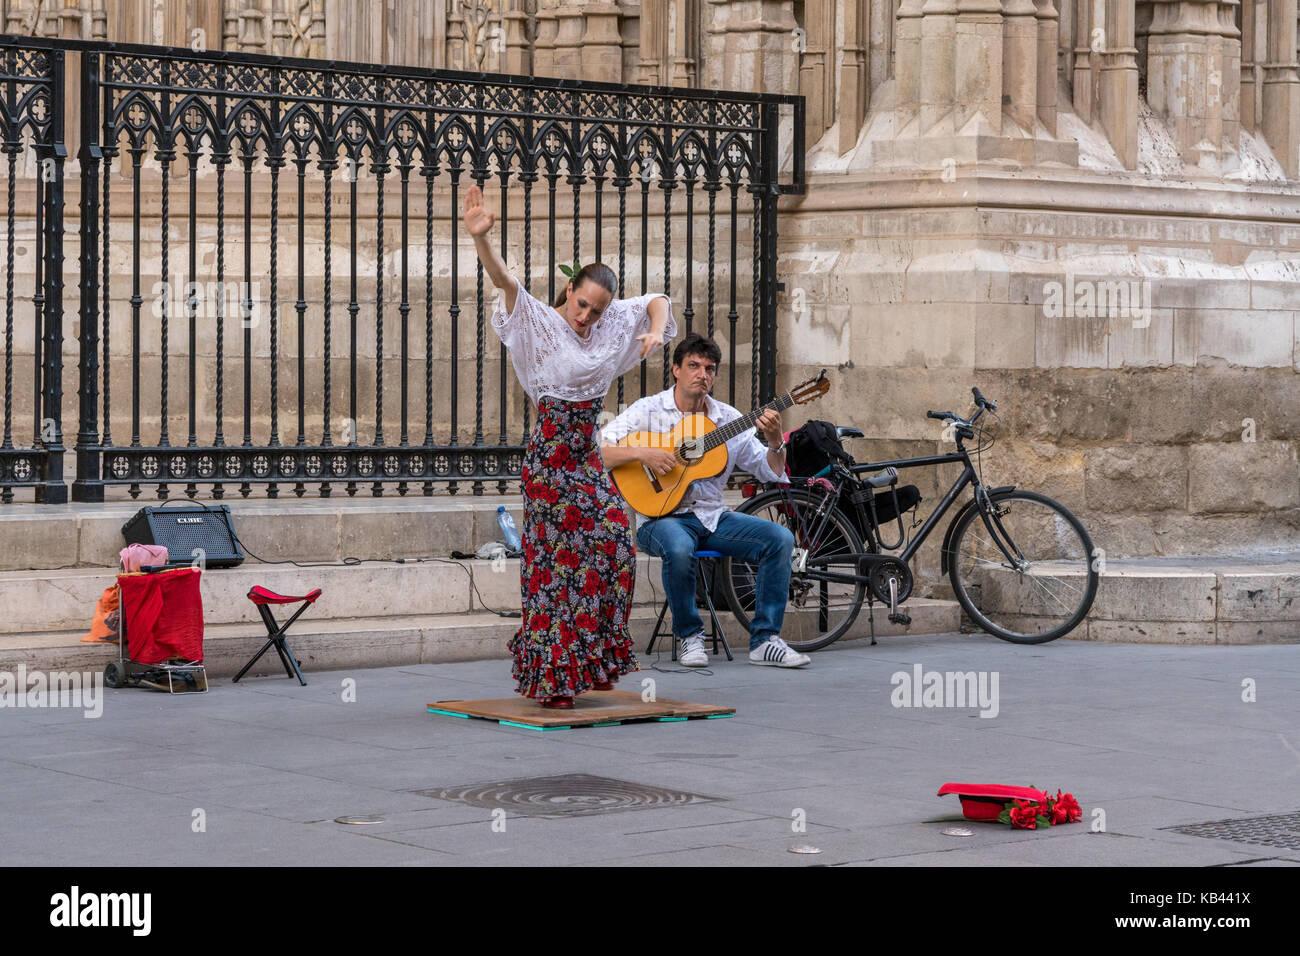 Street artists in Seville, Spain - Stock Image